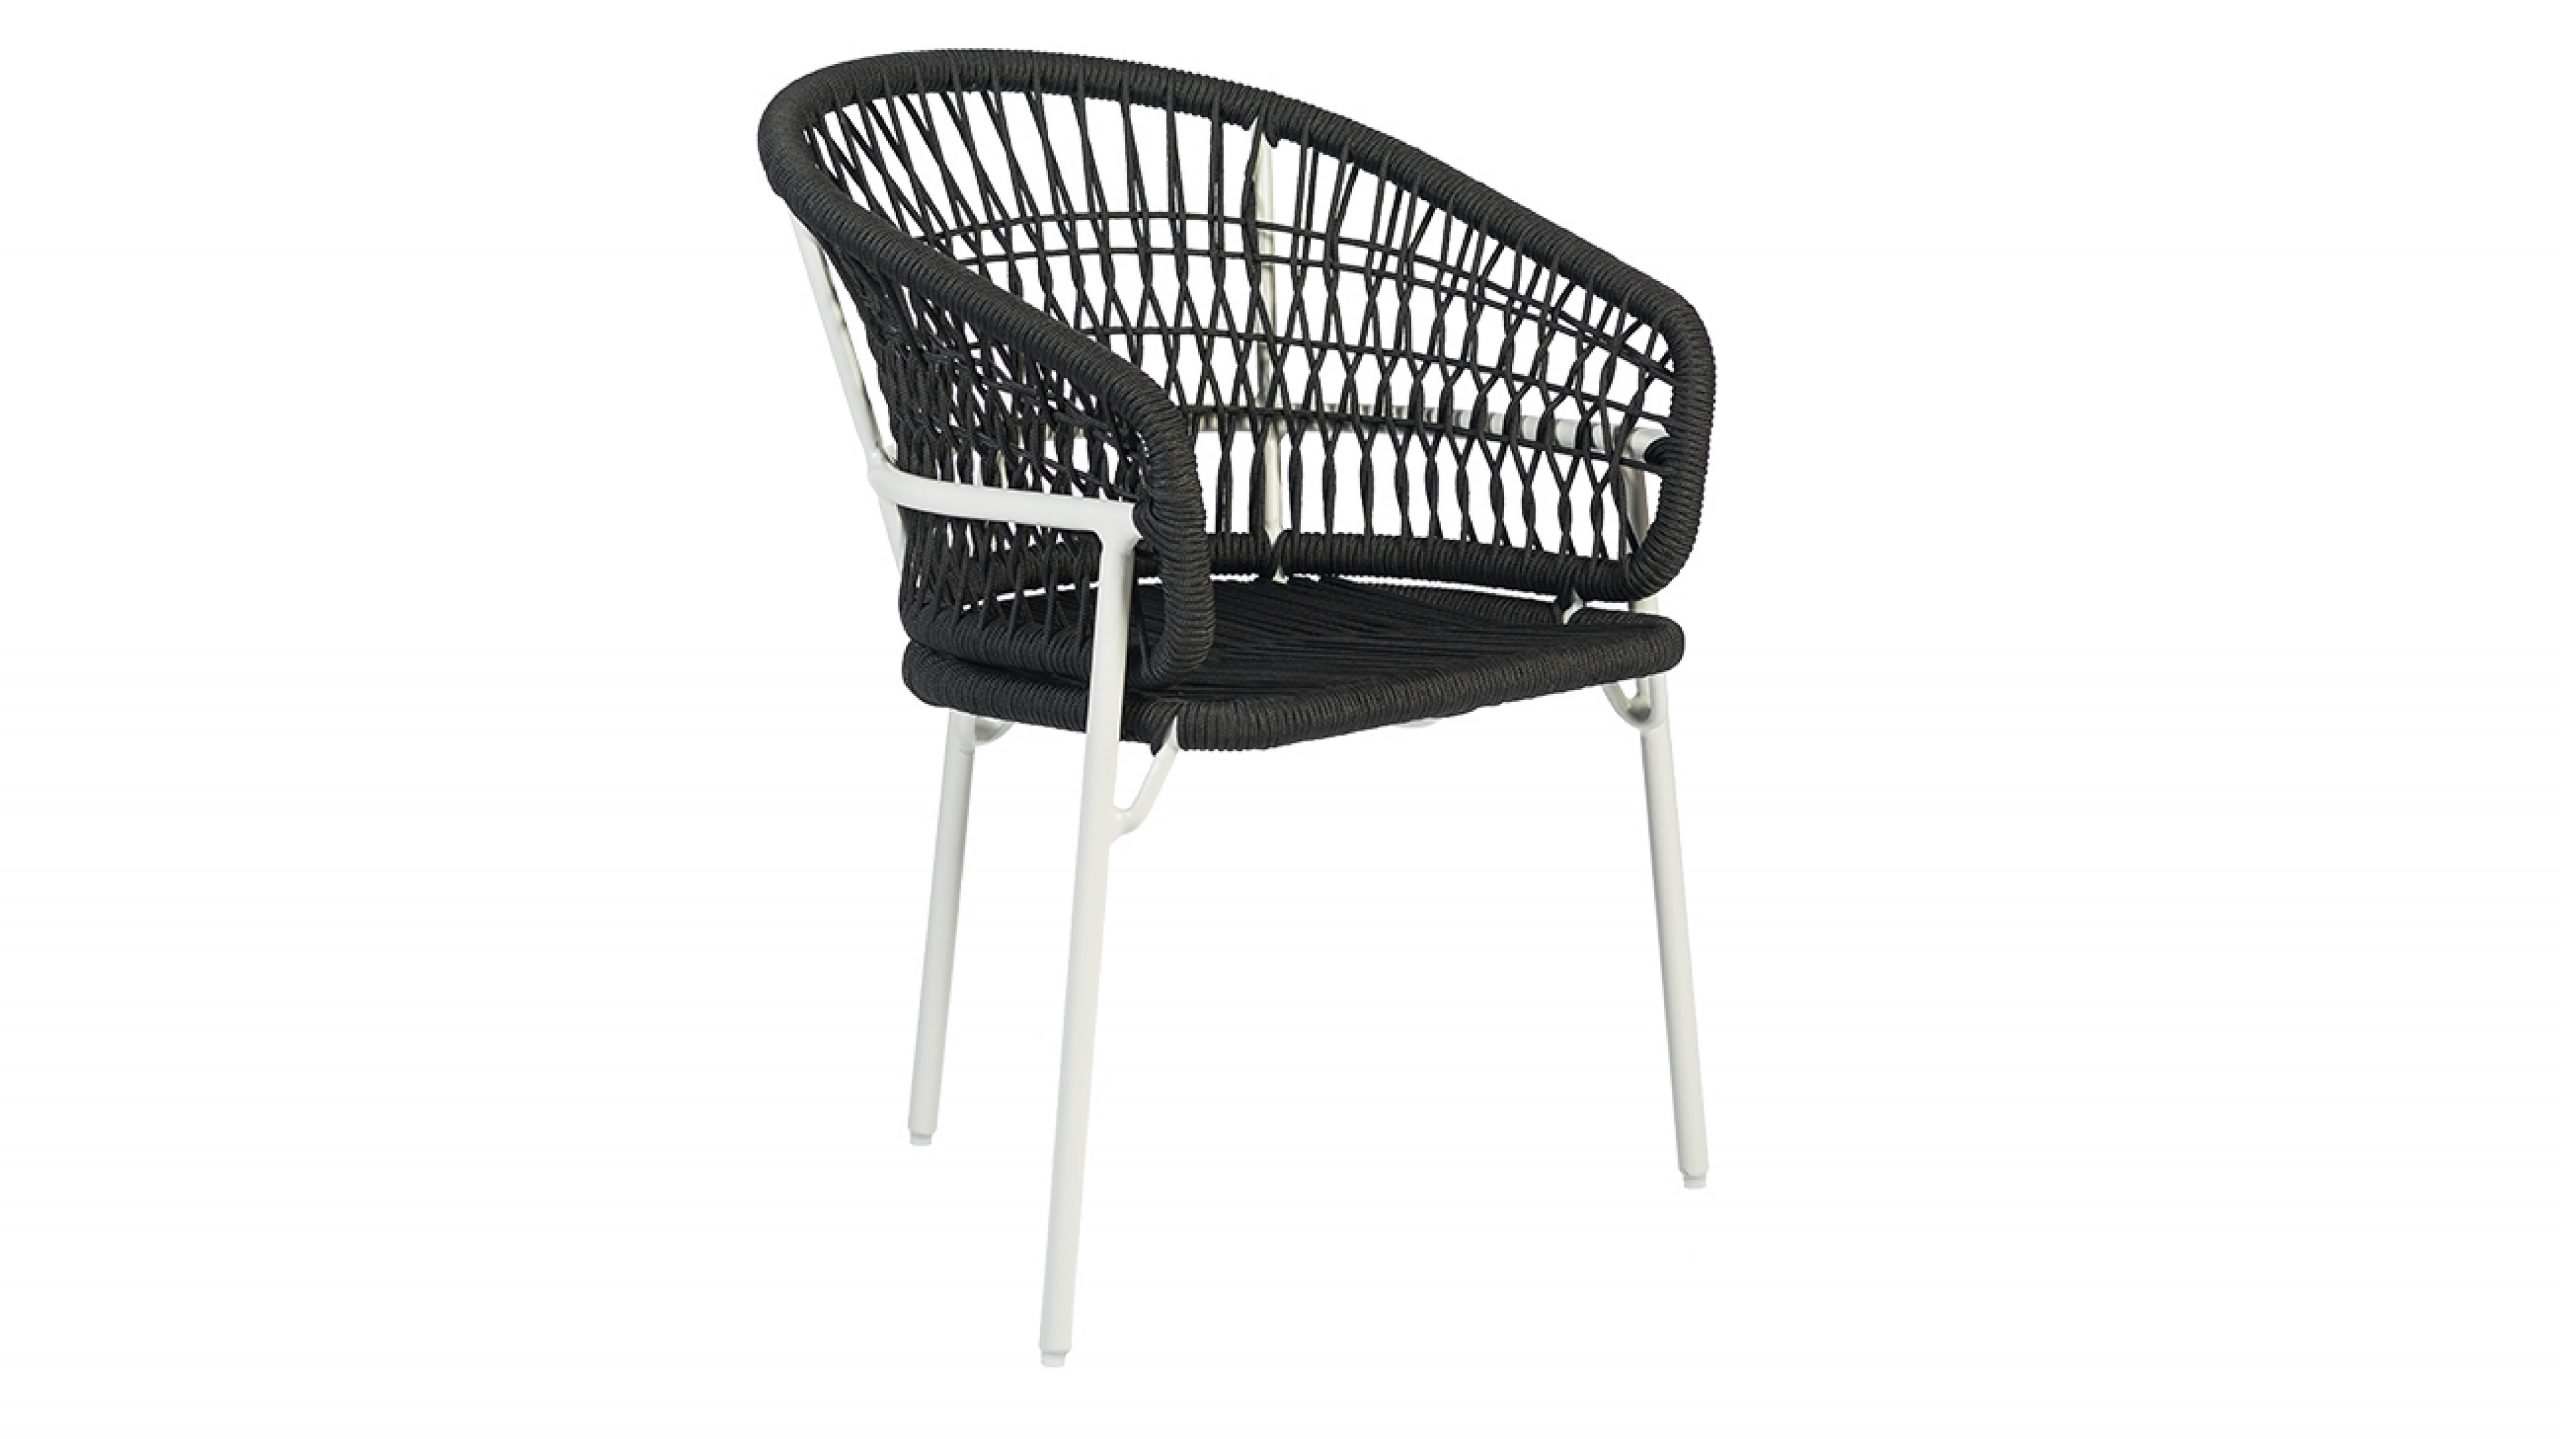 Nave Chair, por Guto Biazzetto.